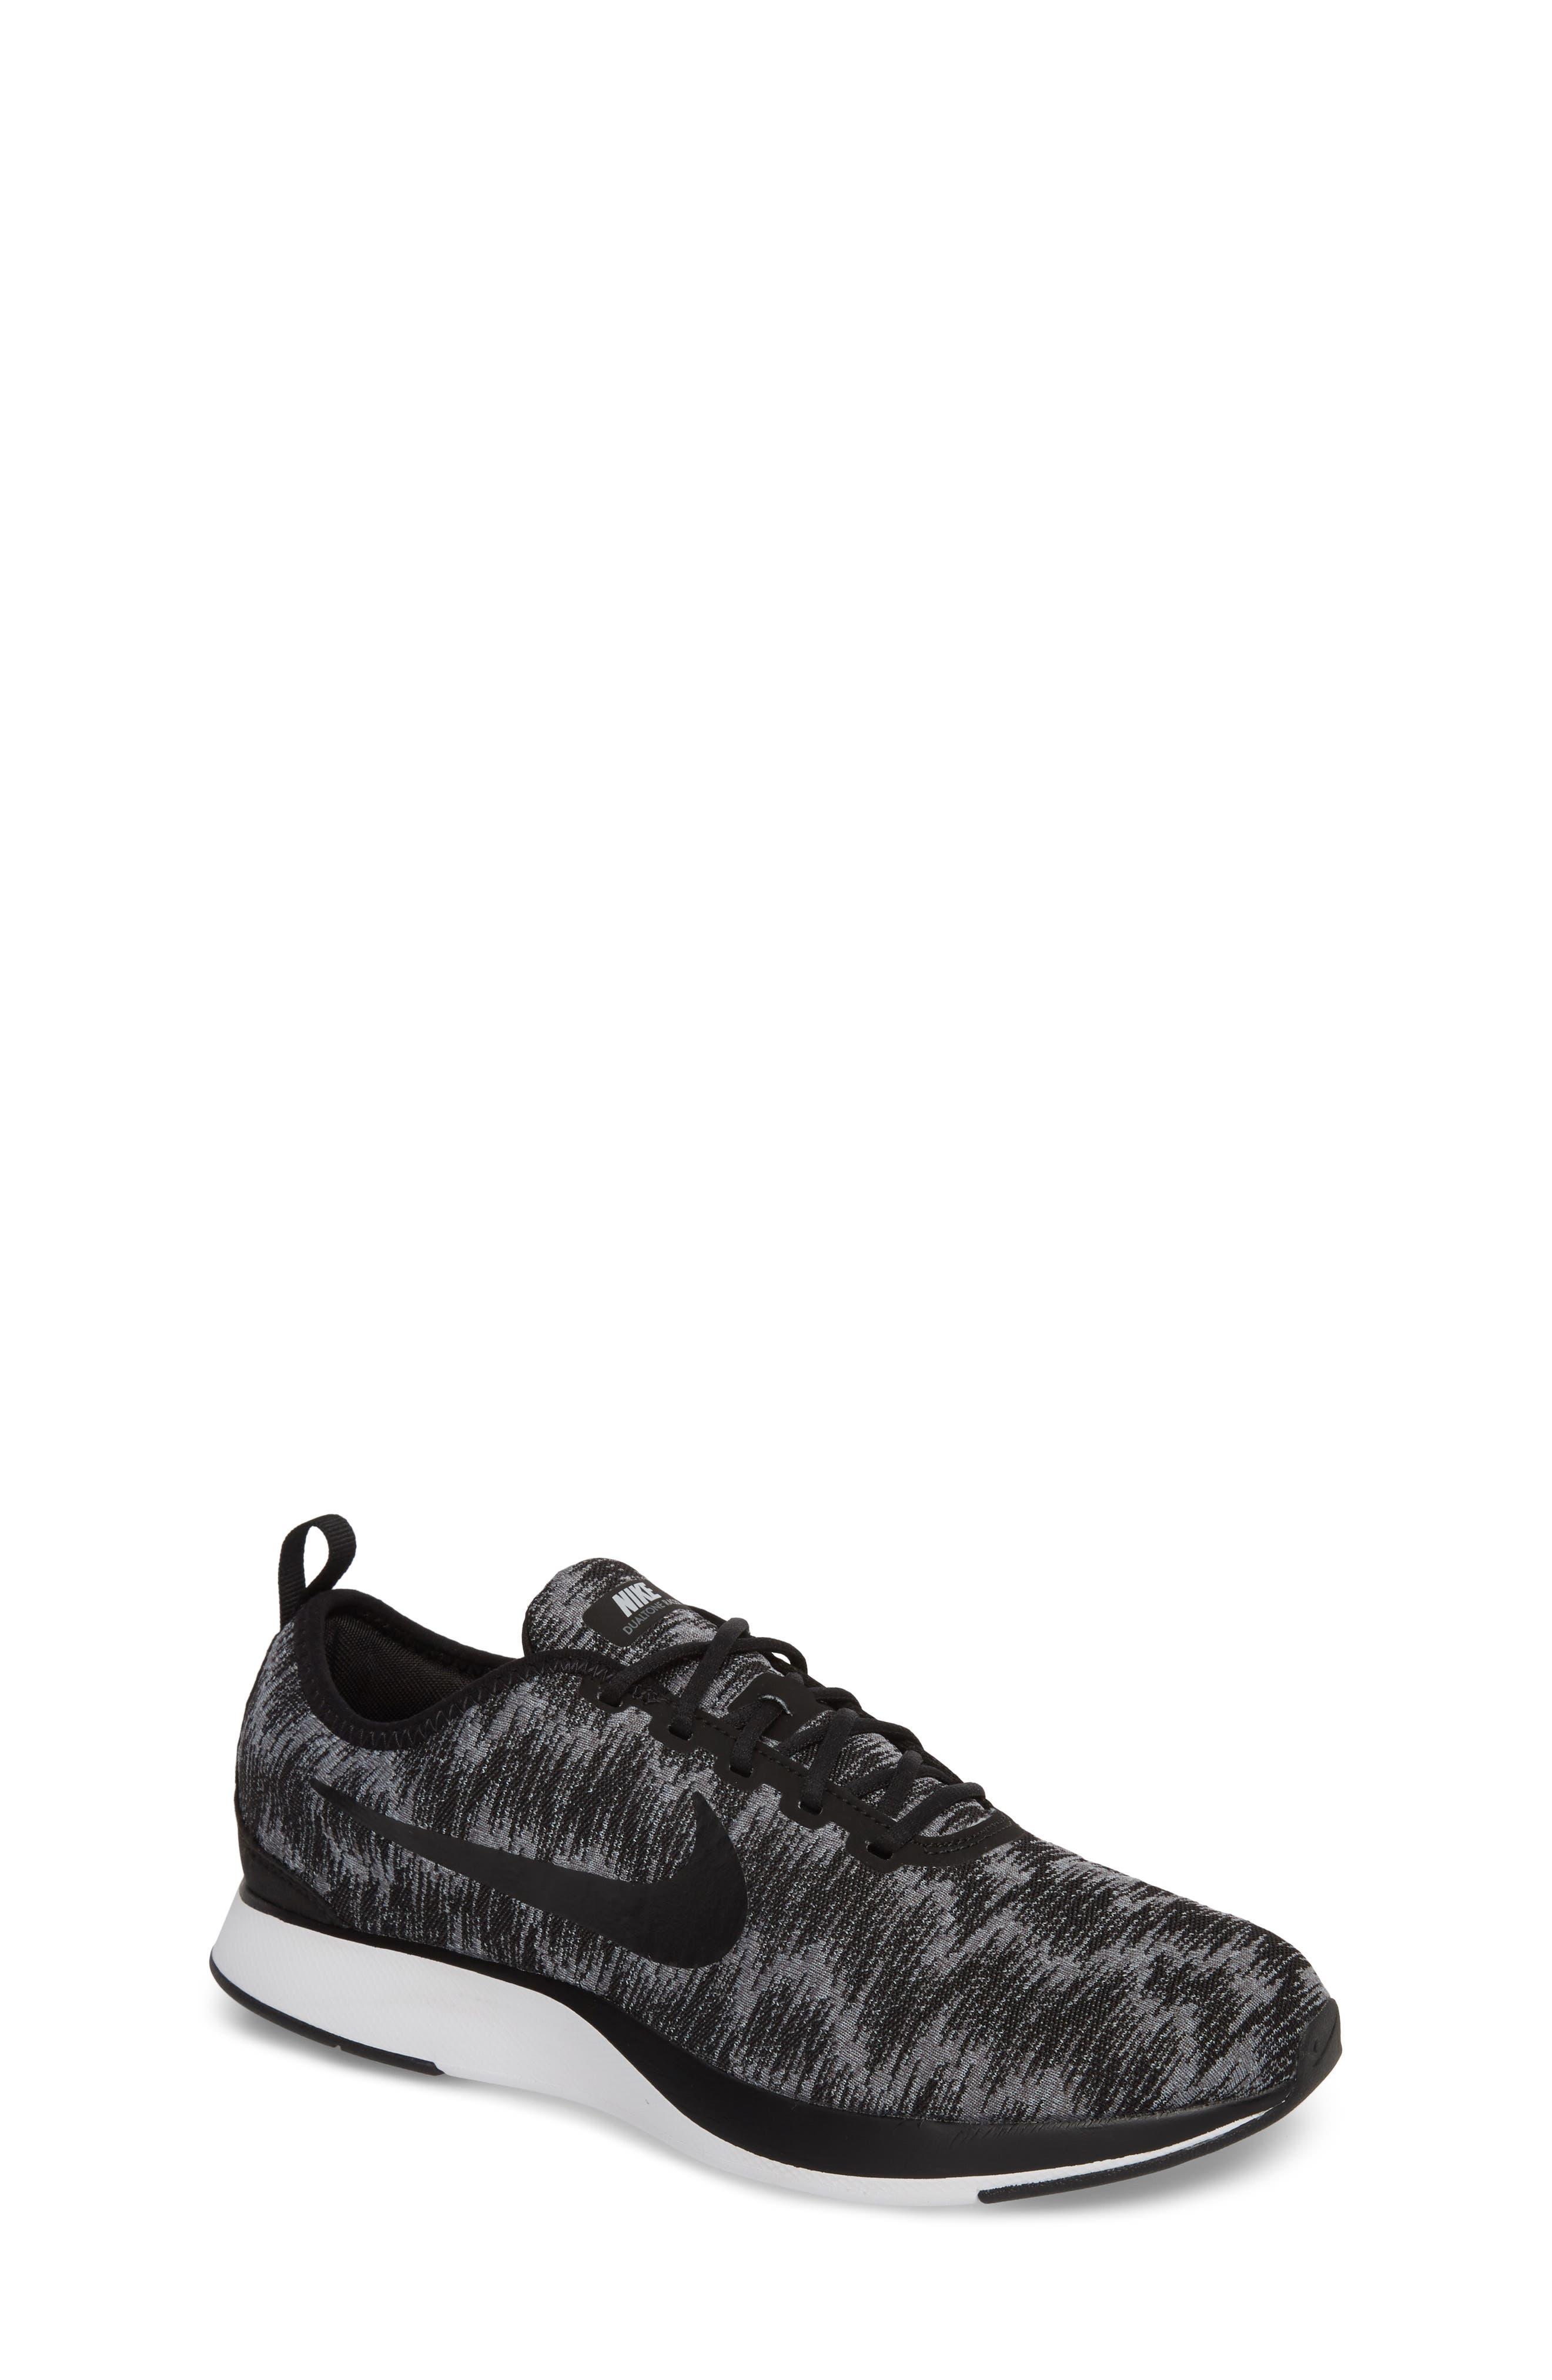 Dualtone Racer SE Sneaker,                             Main thumbnail 1, color,                             004